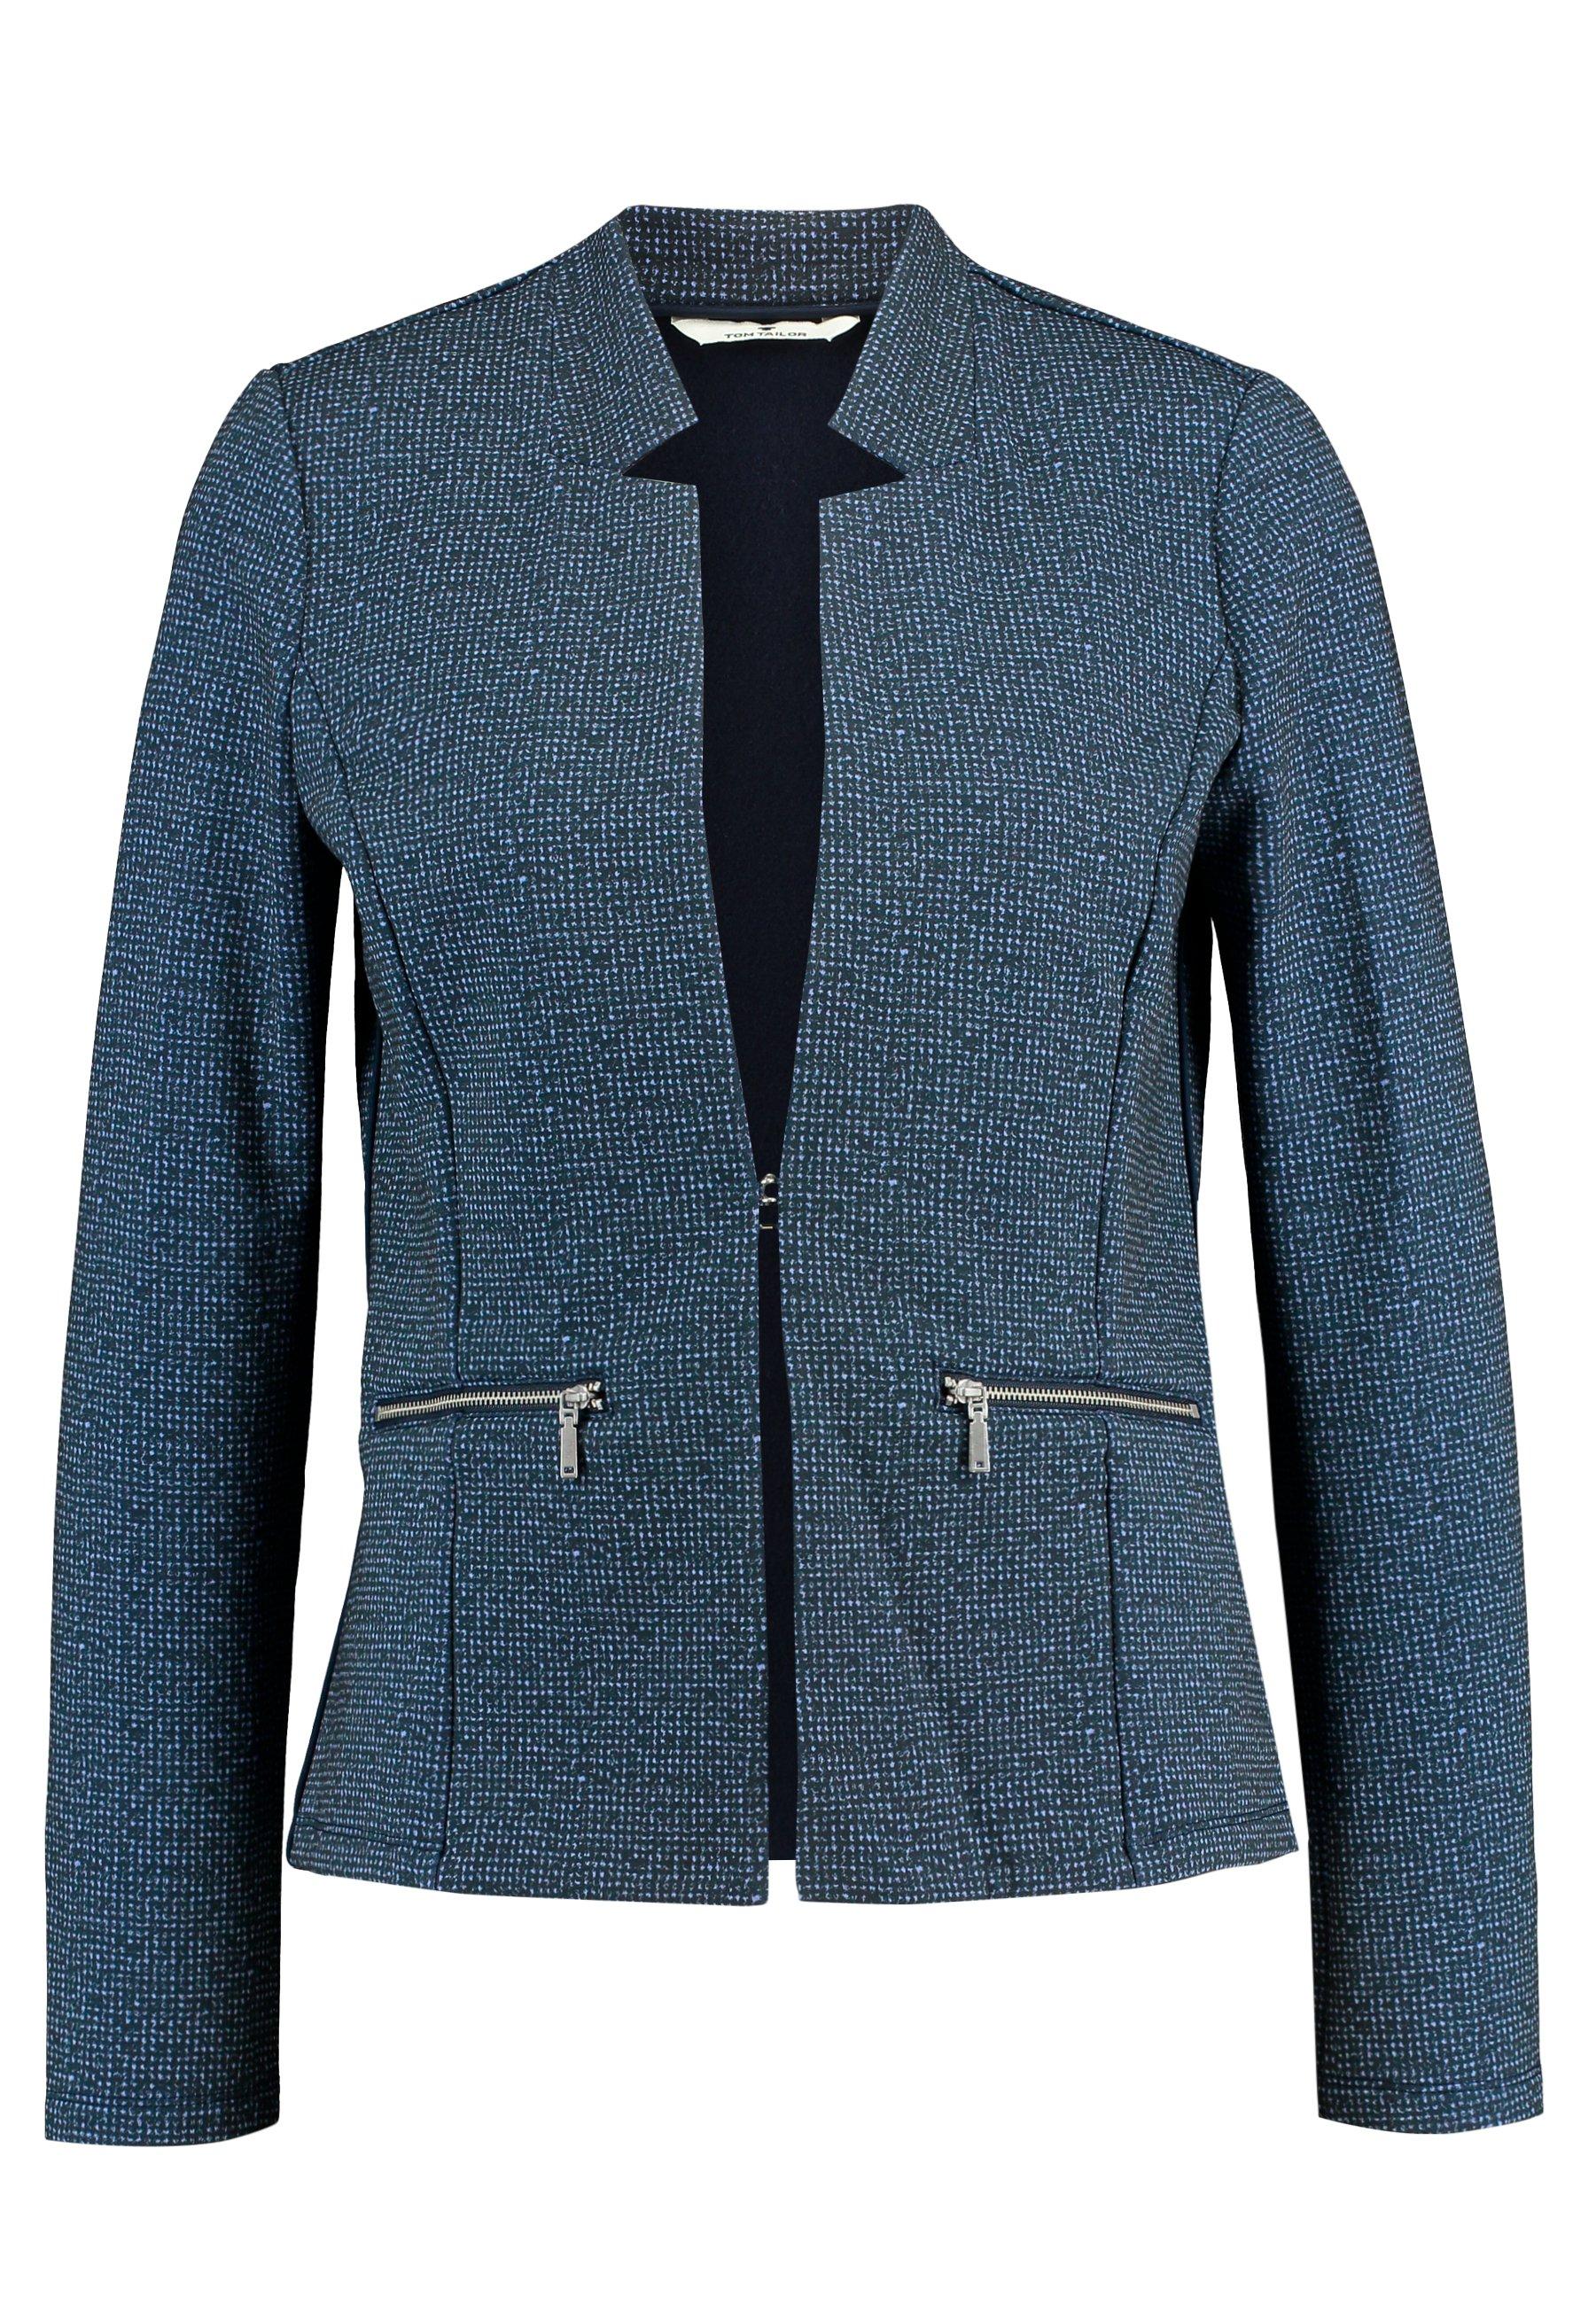 TOM TAILOR EASY STRUCTURE - Blazer - navy blue